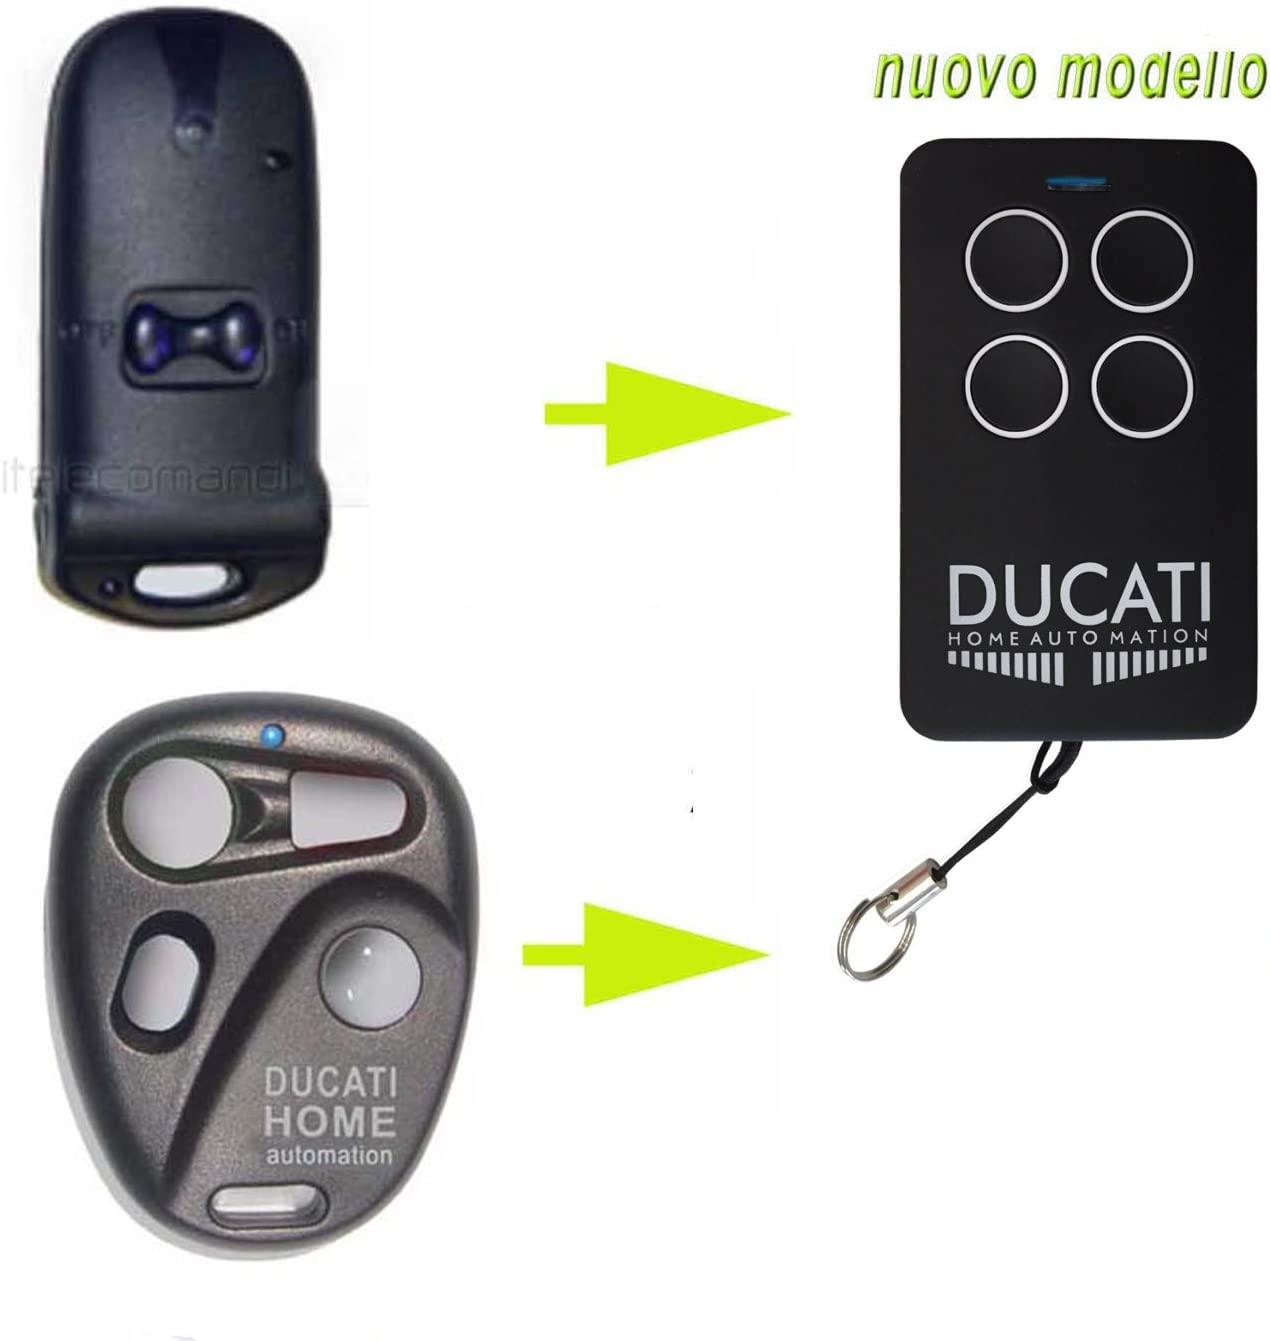 Ducati 6204 Allducks 6204 Original-Fernsteuerung 6203